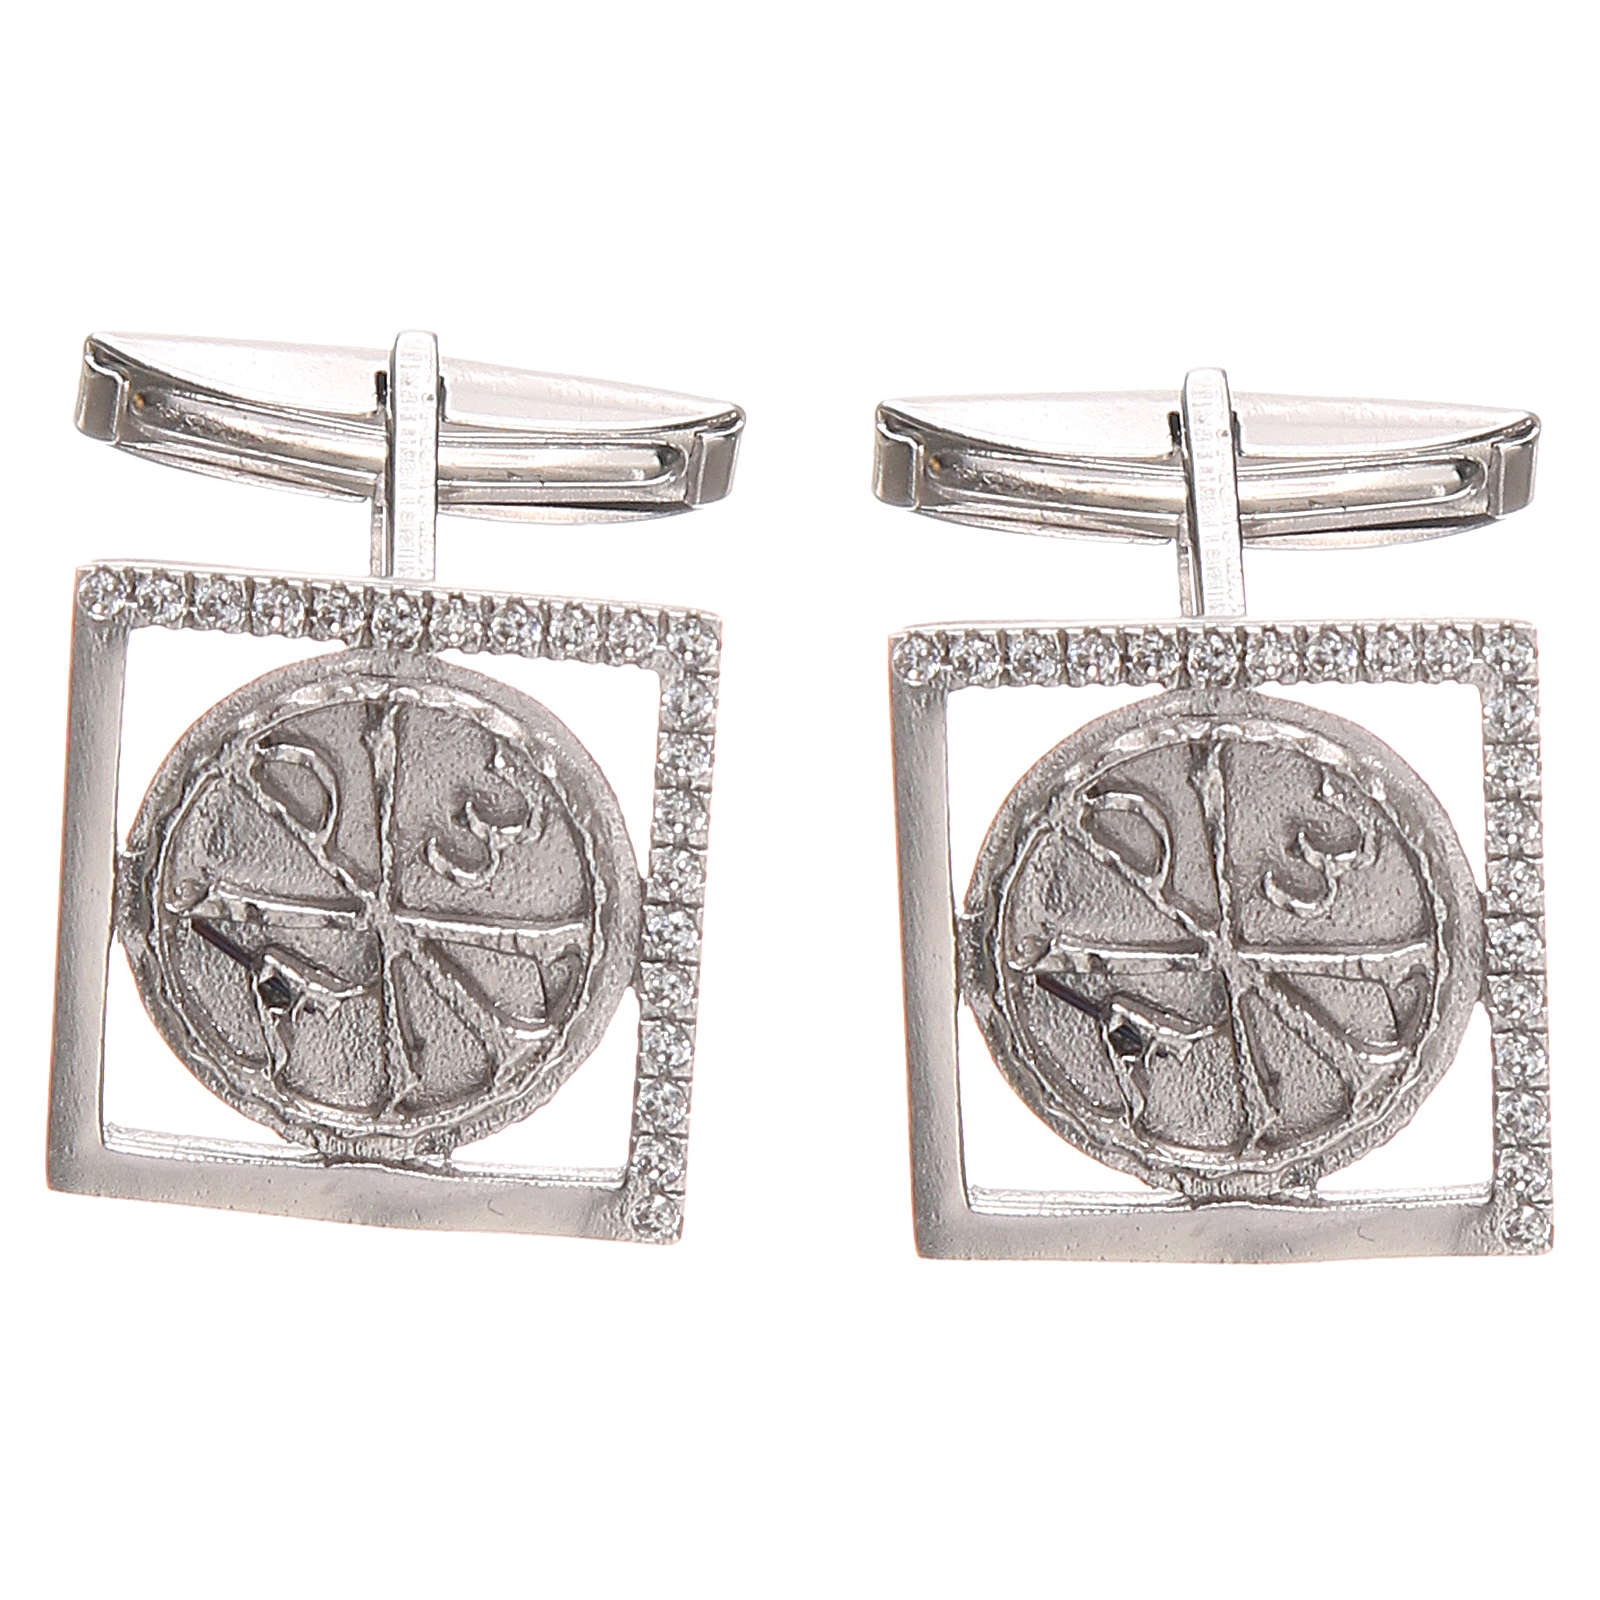 Spinki biżuteria srebro 925 symbol PAX 1.7x1.7 cm 4